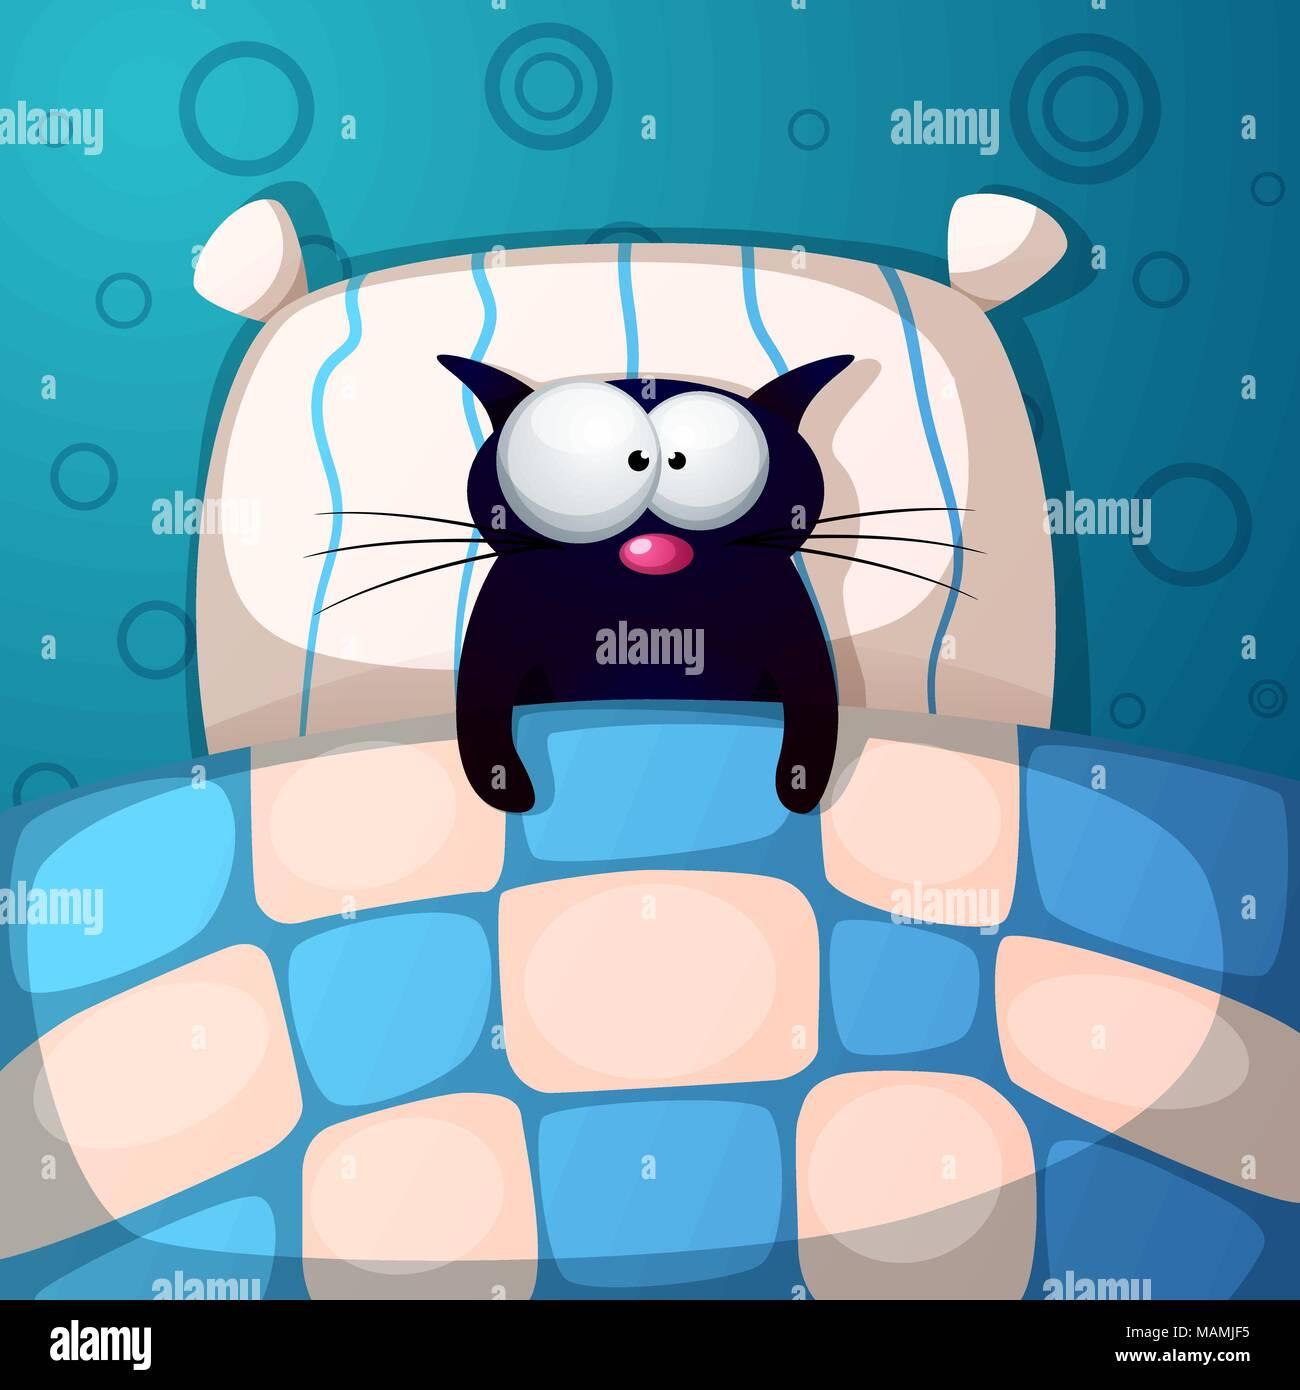 Cat Bed Mattress Stock Photos Amp Cat Bed Mattress Stock